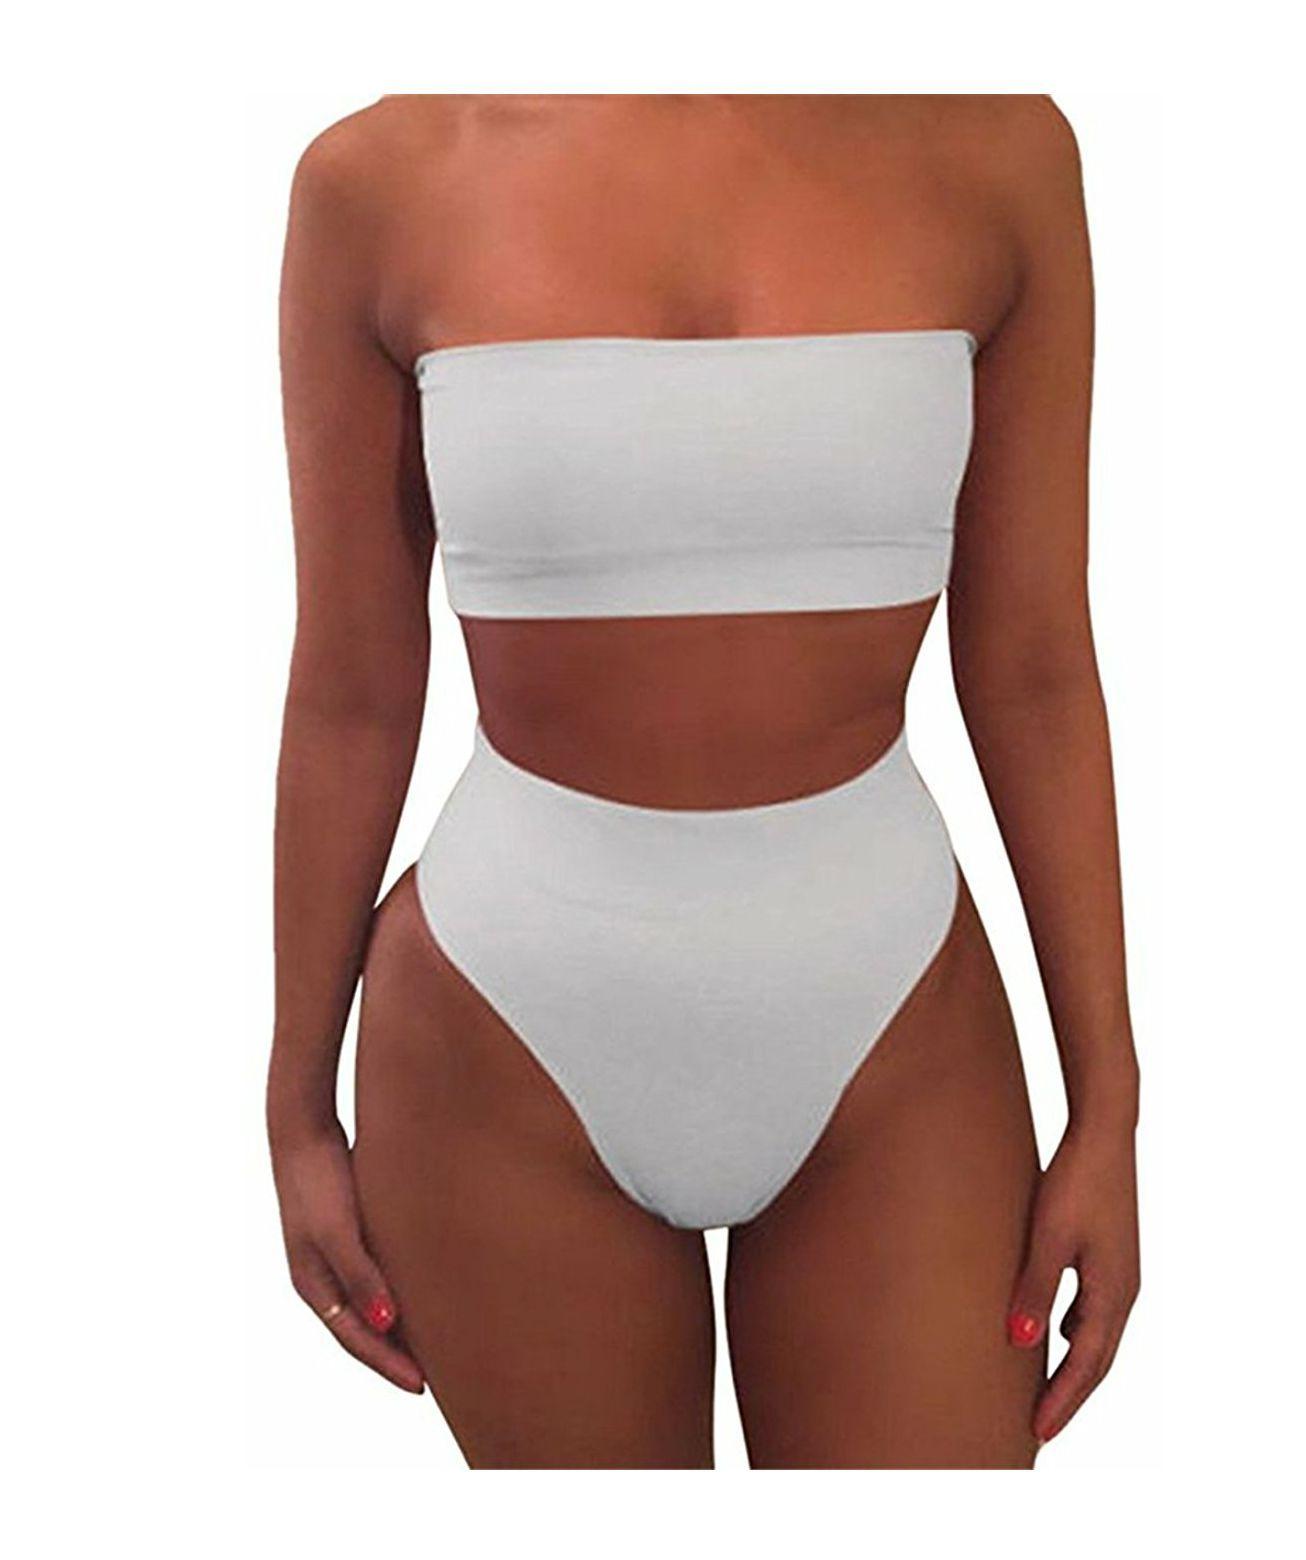 2a3b0d8f6a89c Two Piece Tube Top Bikini